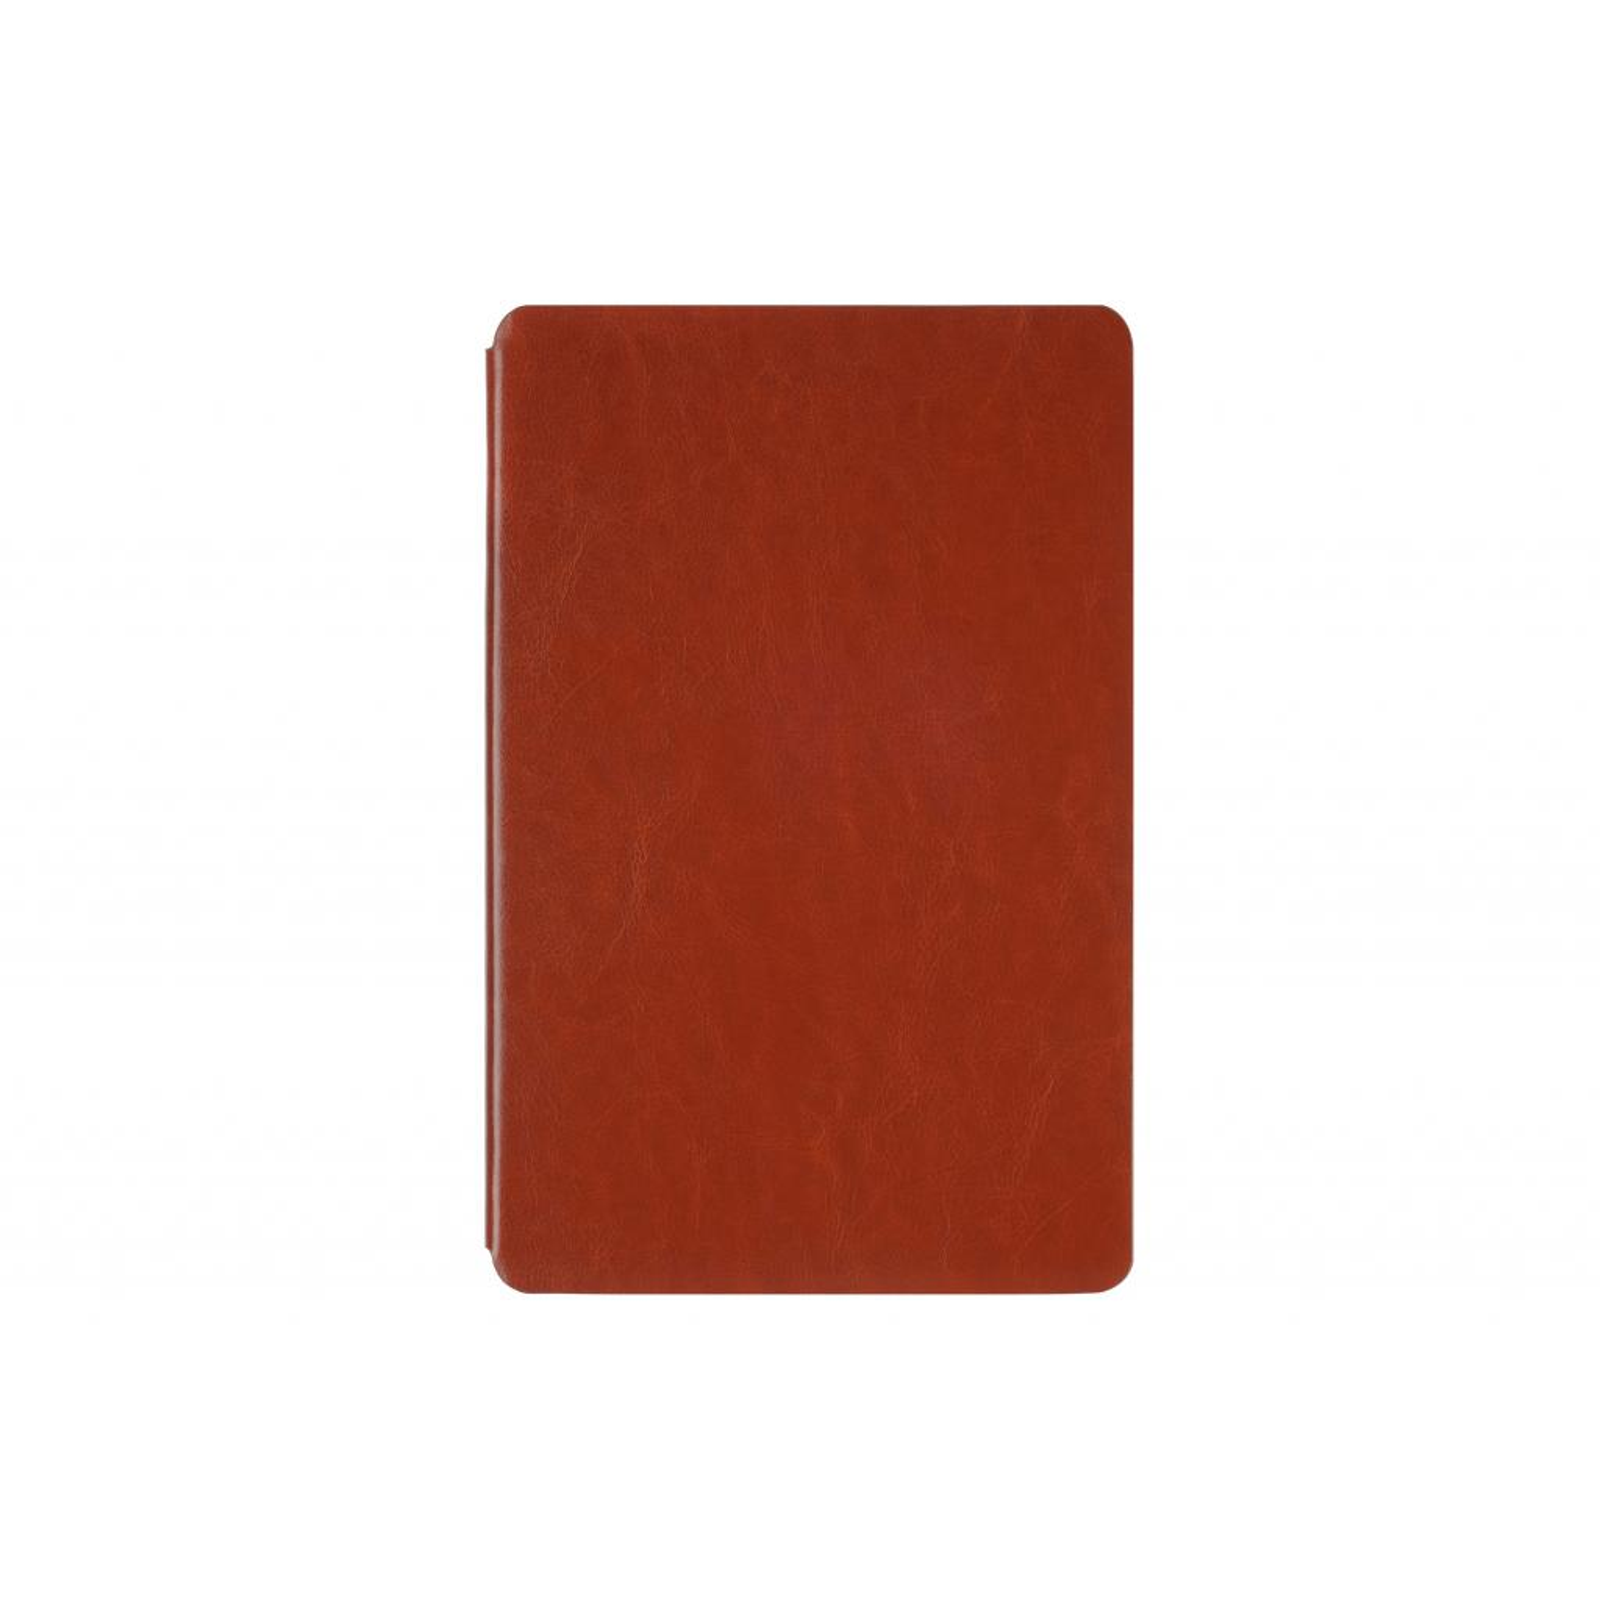 Чохол до планшета 2E Samsung Galaxy Tab S6, Retro, Brown (2E-G-S6-IKRT-BR)